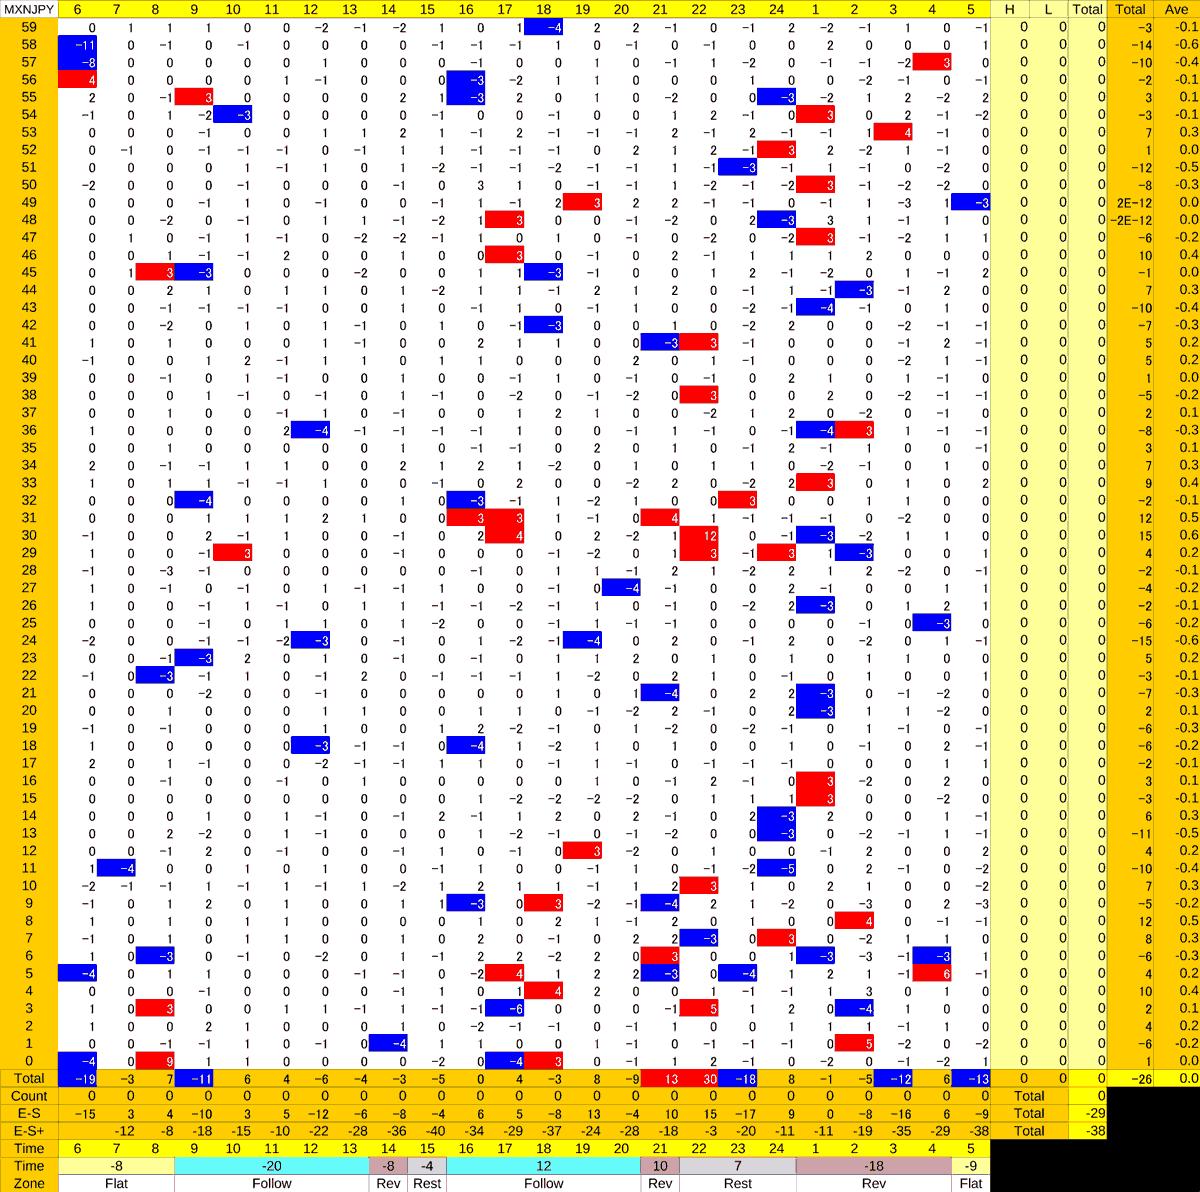 20201222_HS(3)MXNJPY